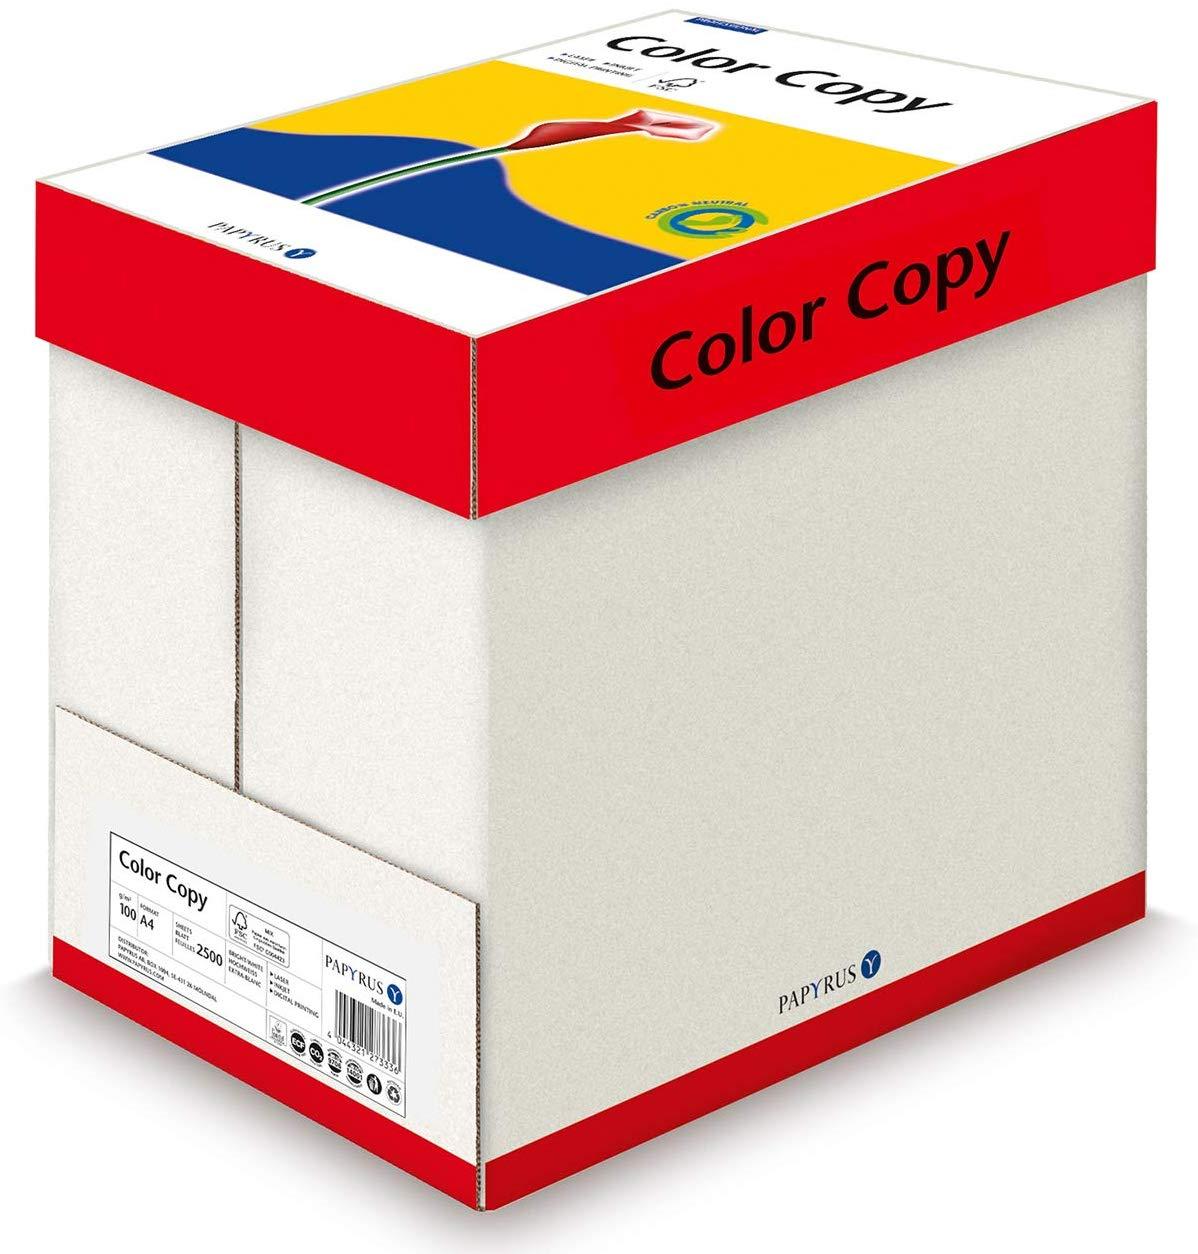 Papyrus 88007859 Drucker-/Kopierpapier, Farblaserpapier ColorCopy 100 g/m² A4, 2500 Blatt satiniert